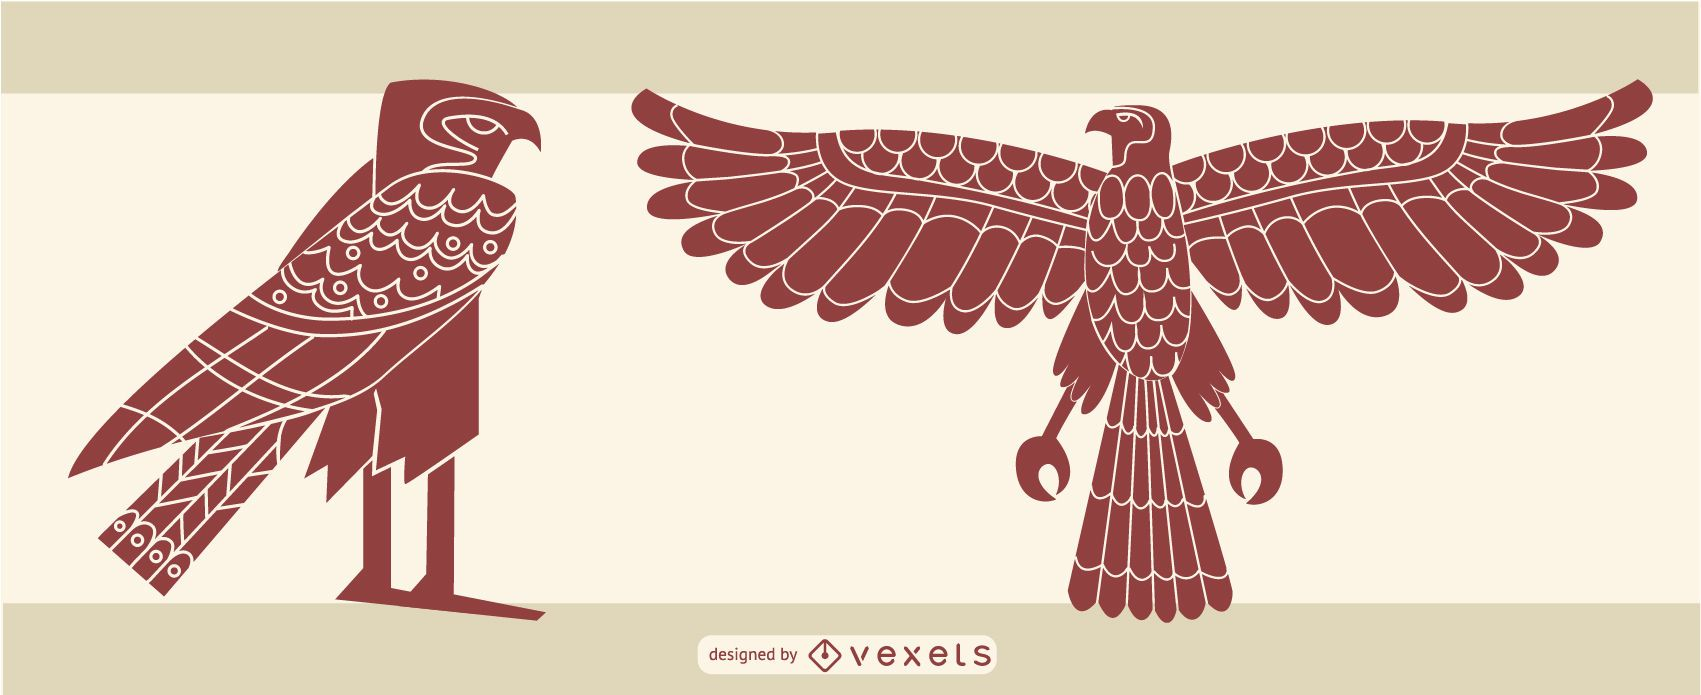 elegante diseño de águila egipcia